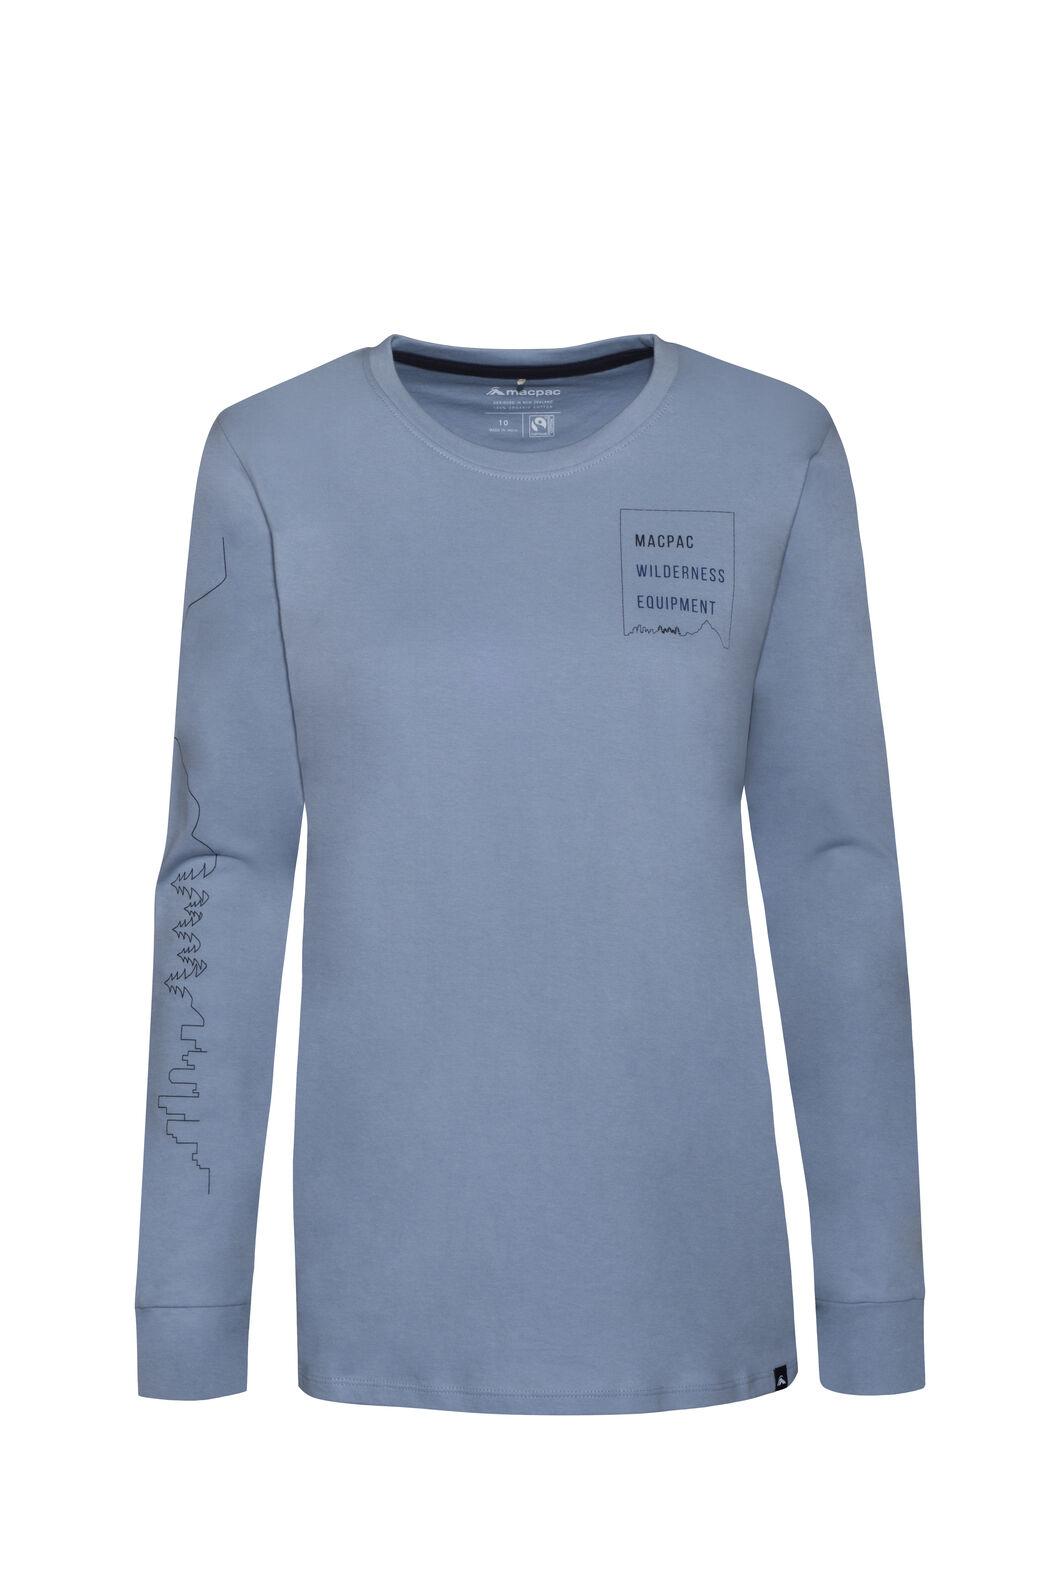 Macpac Wilderness Equipment Fairtrade Organic Cotton Long Sleeve Tee — Women's, Blue Fog, hi-res